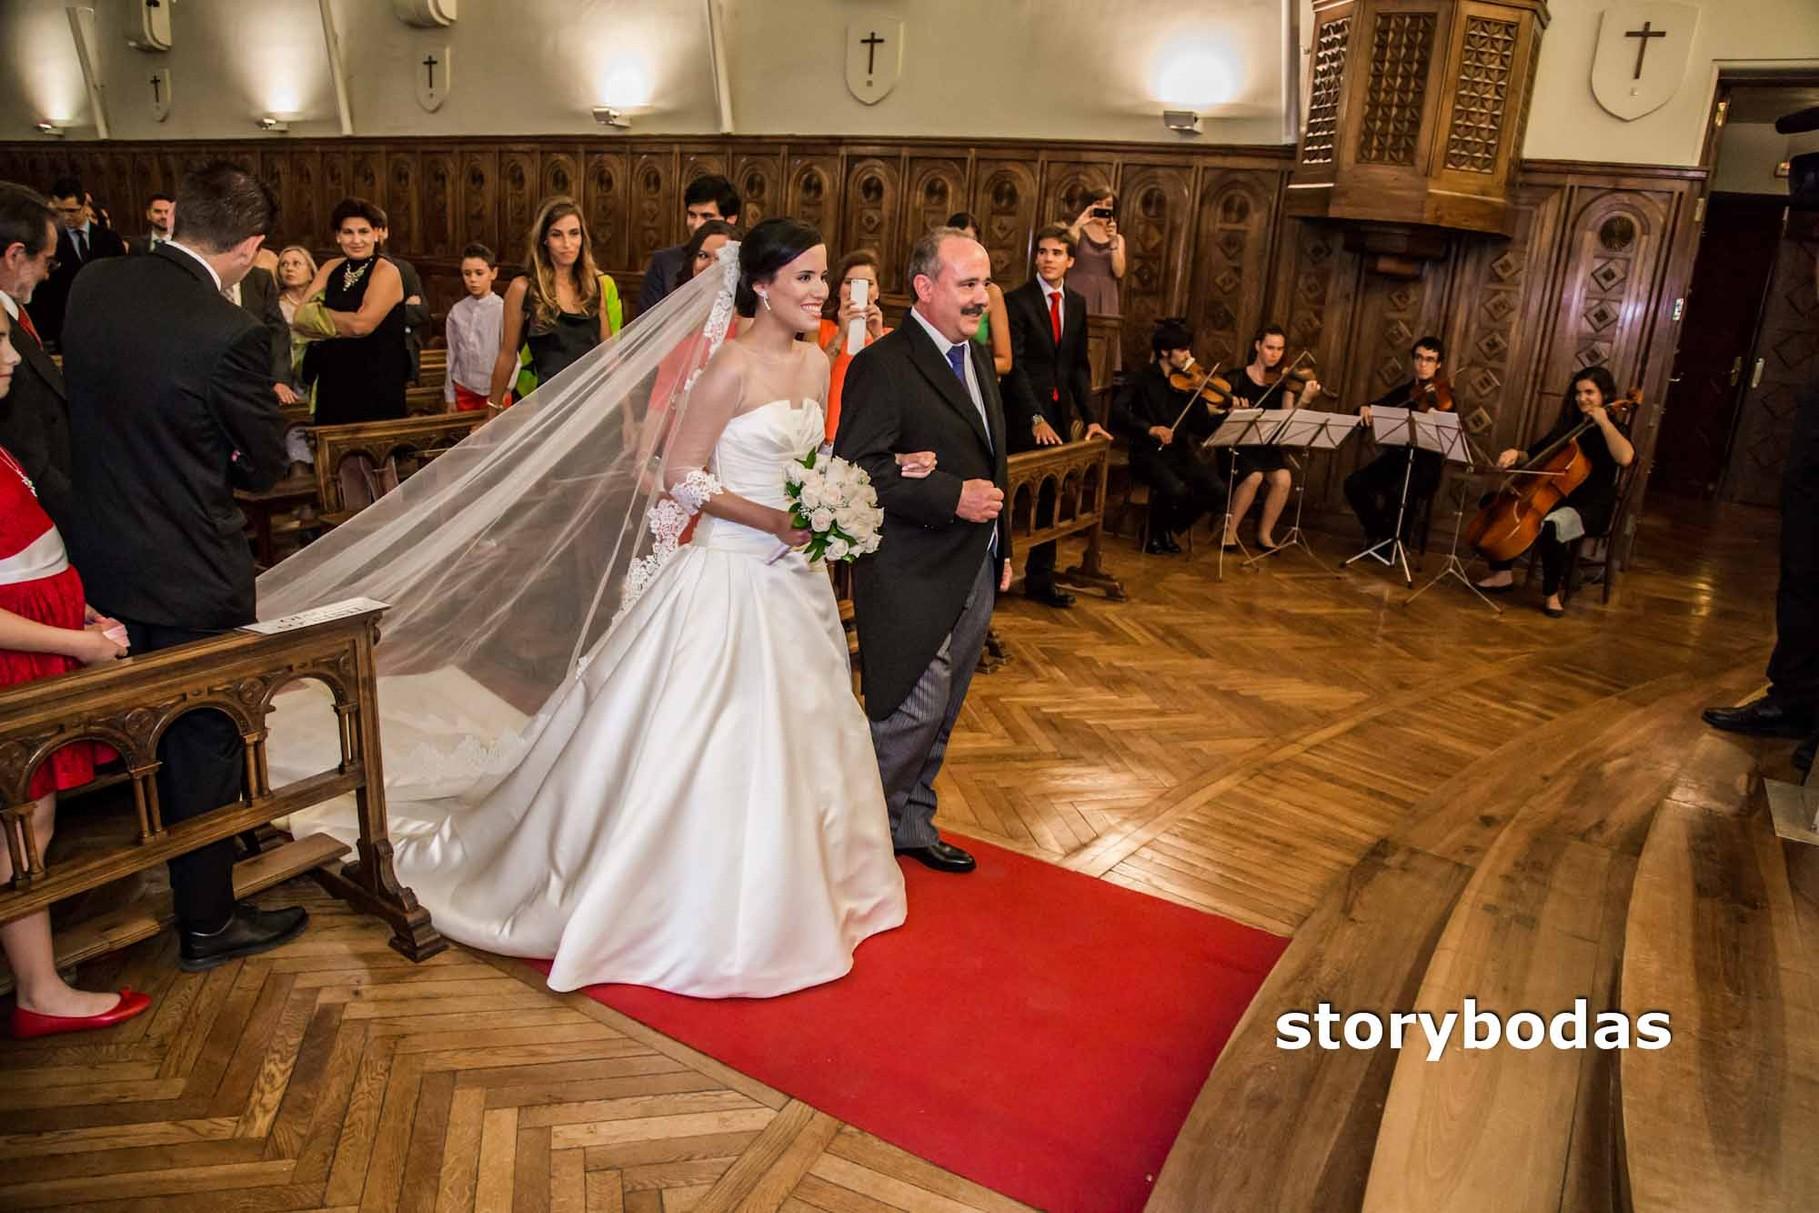 storybodas Llega la novia a la Ceremonia 3